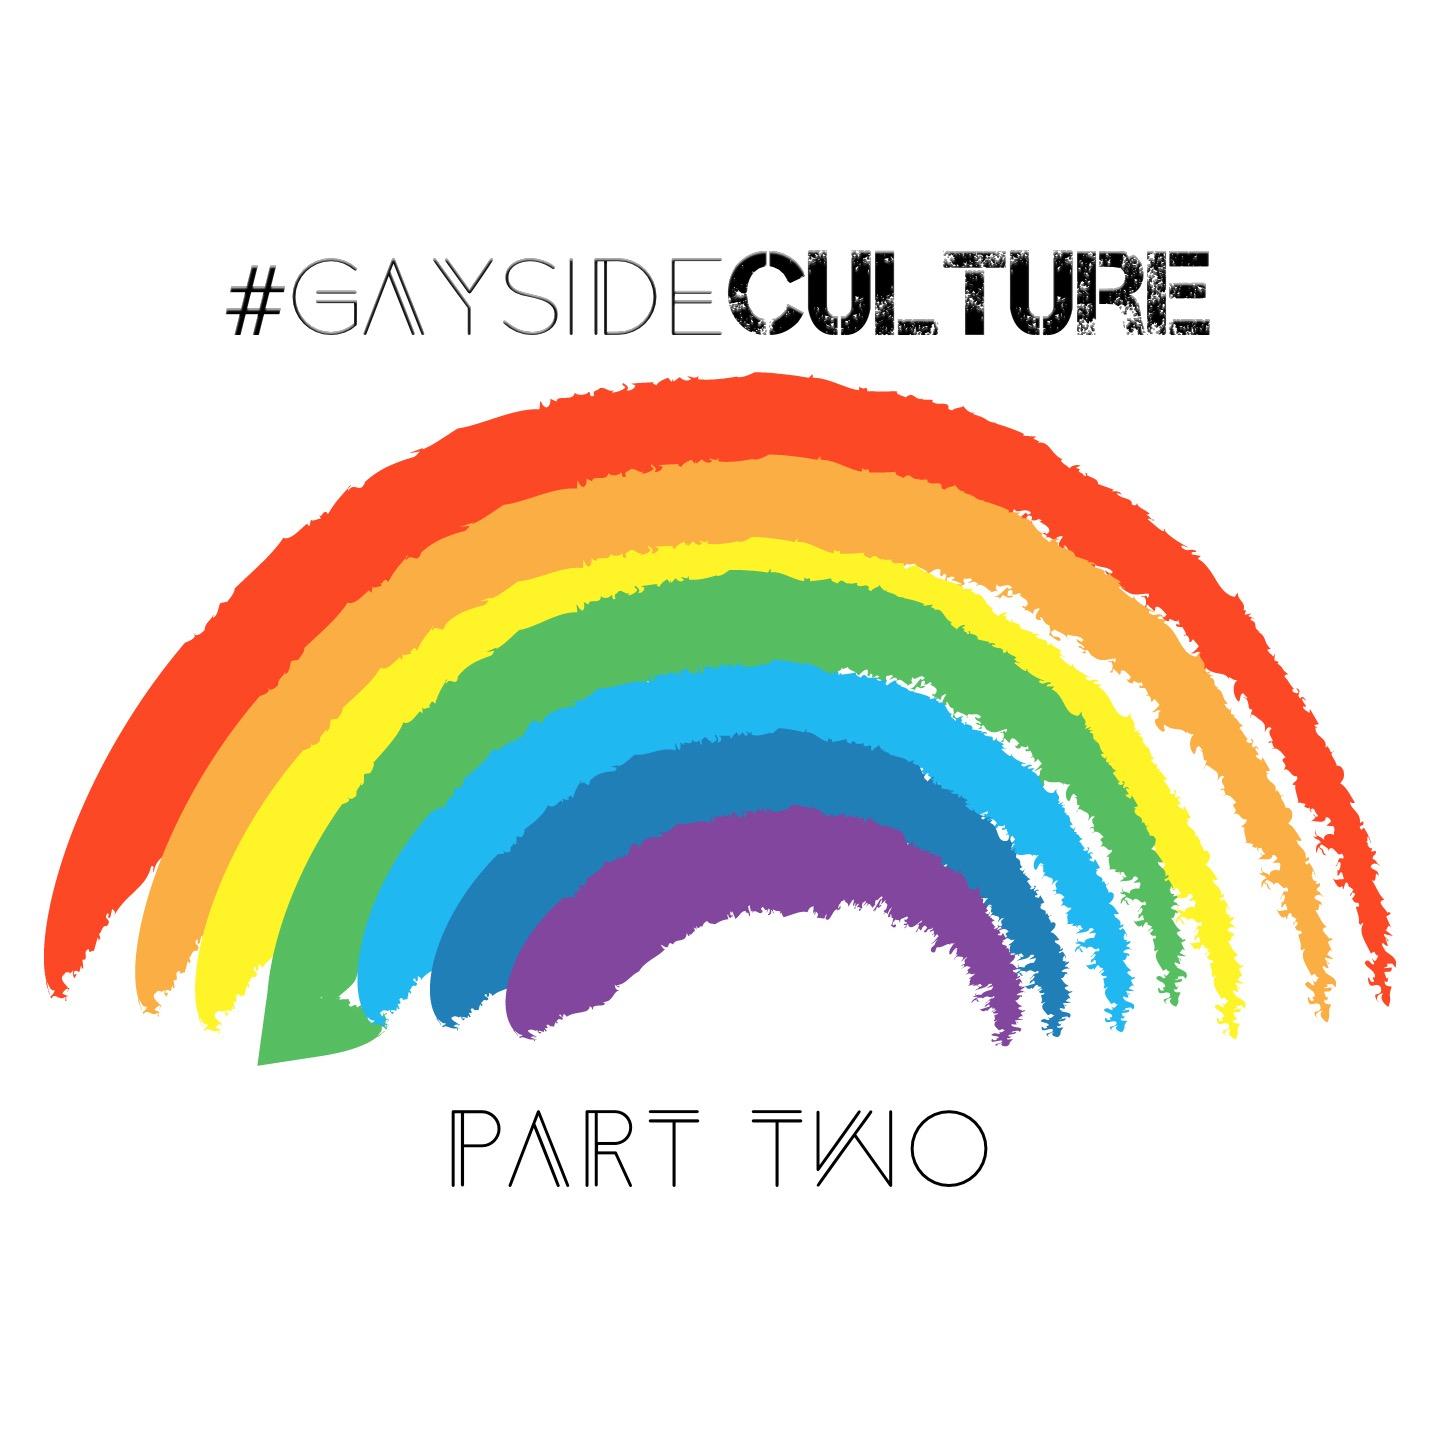 Ep. 77 - #GaysideCulture, Pt. 2 (feat. J.W. Richard)